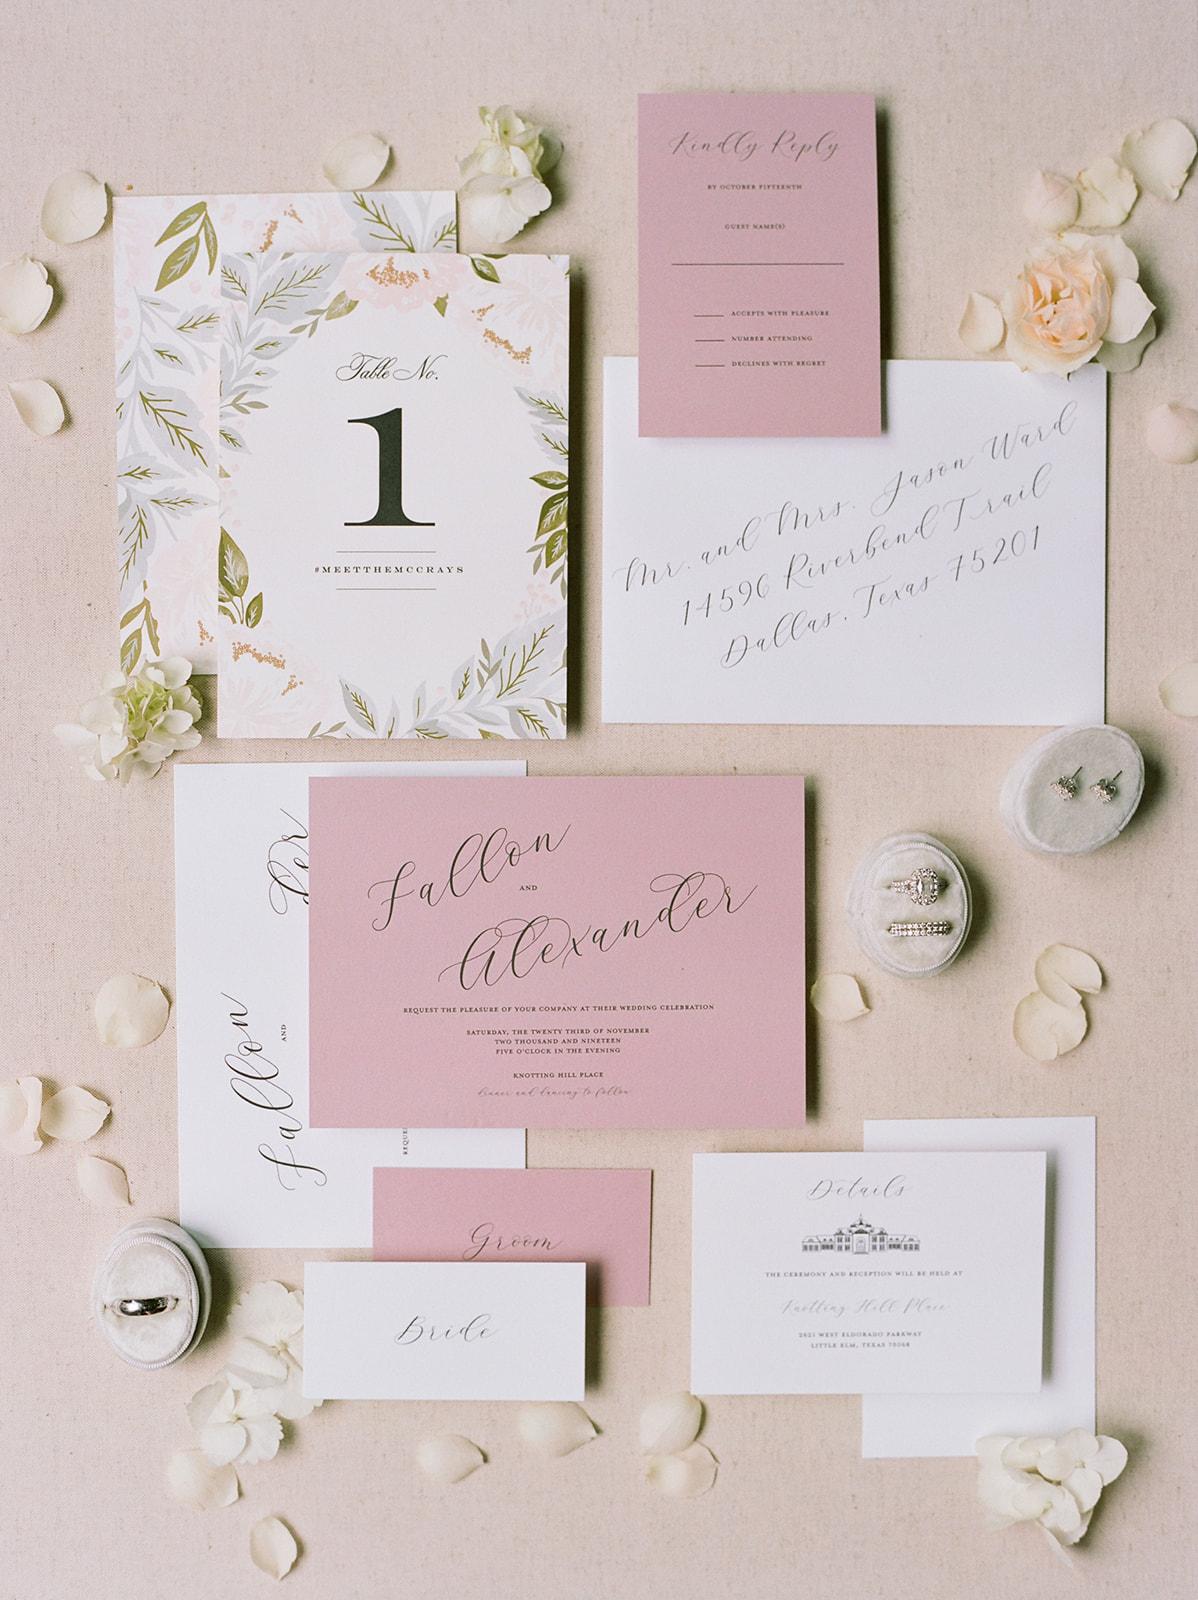 Dusty Pink Wedding Dress: Luxurious Knotting Hill Place Wedding